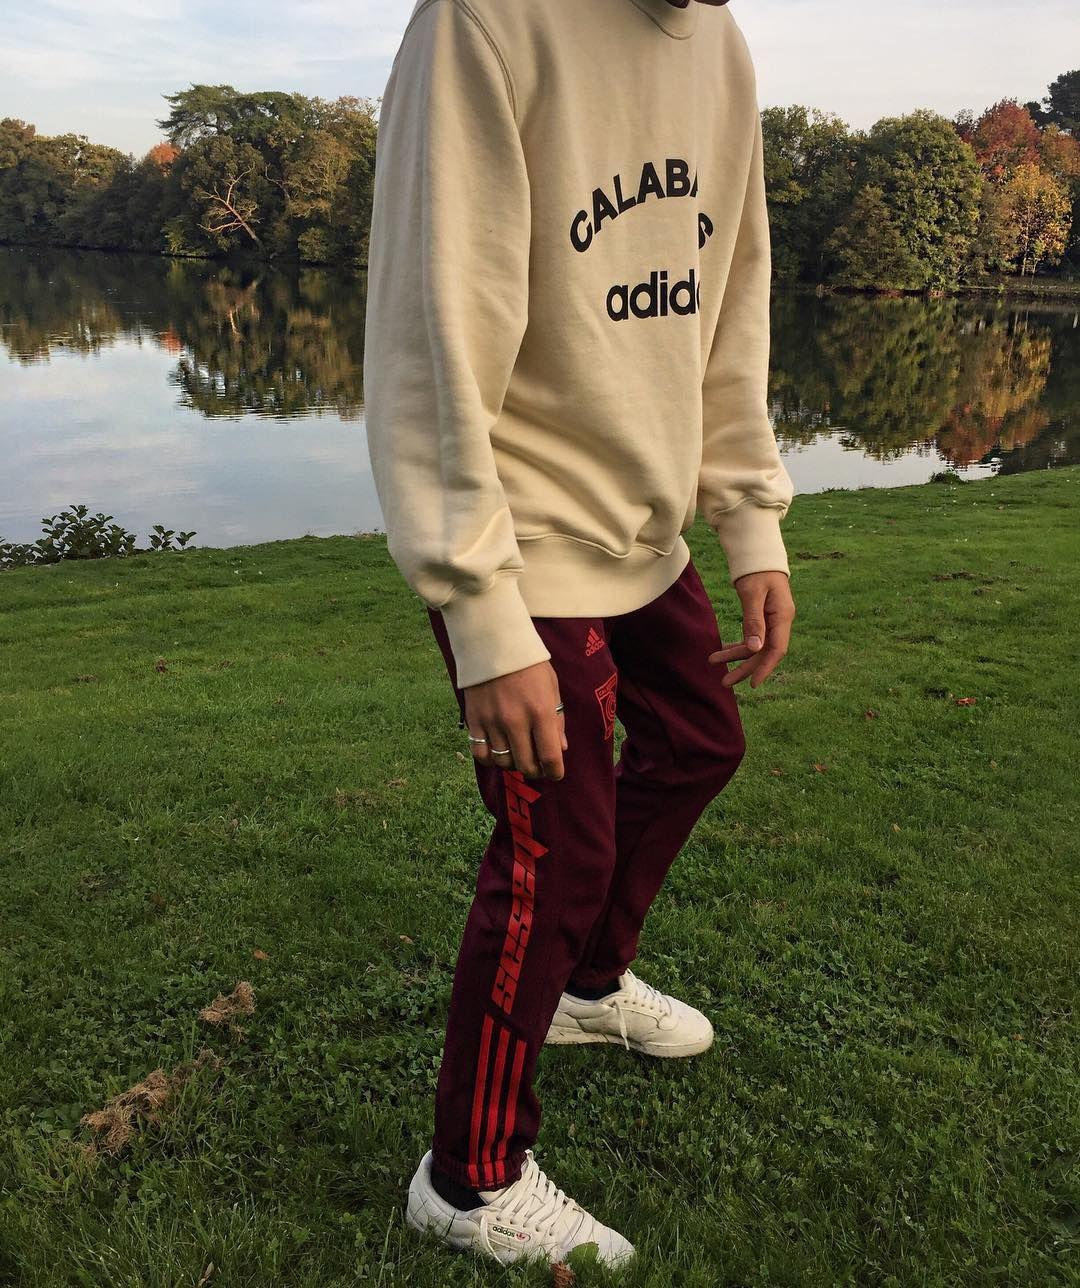 cdb71e775919d Best Instagram Outfits This Week  adidas Calabasas   Supreme